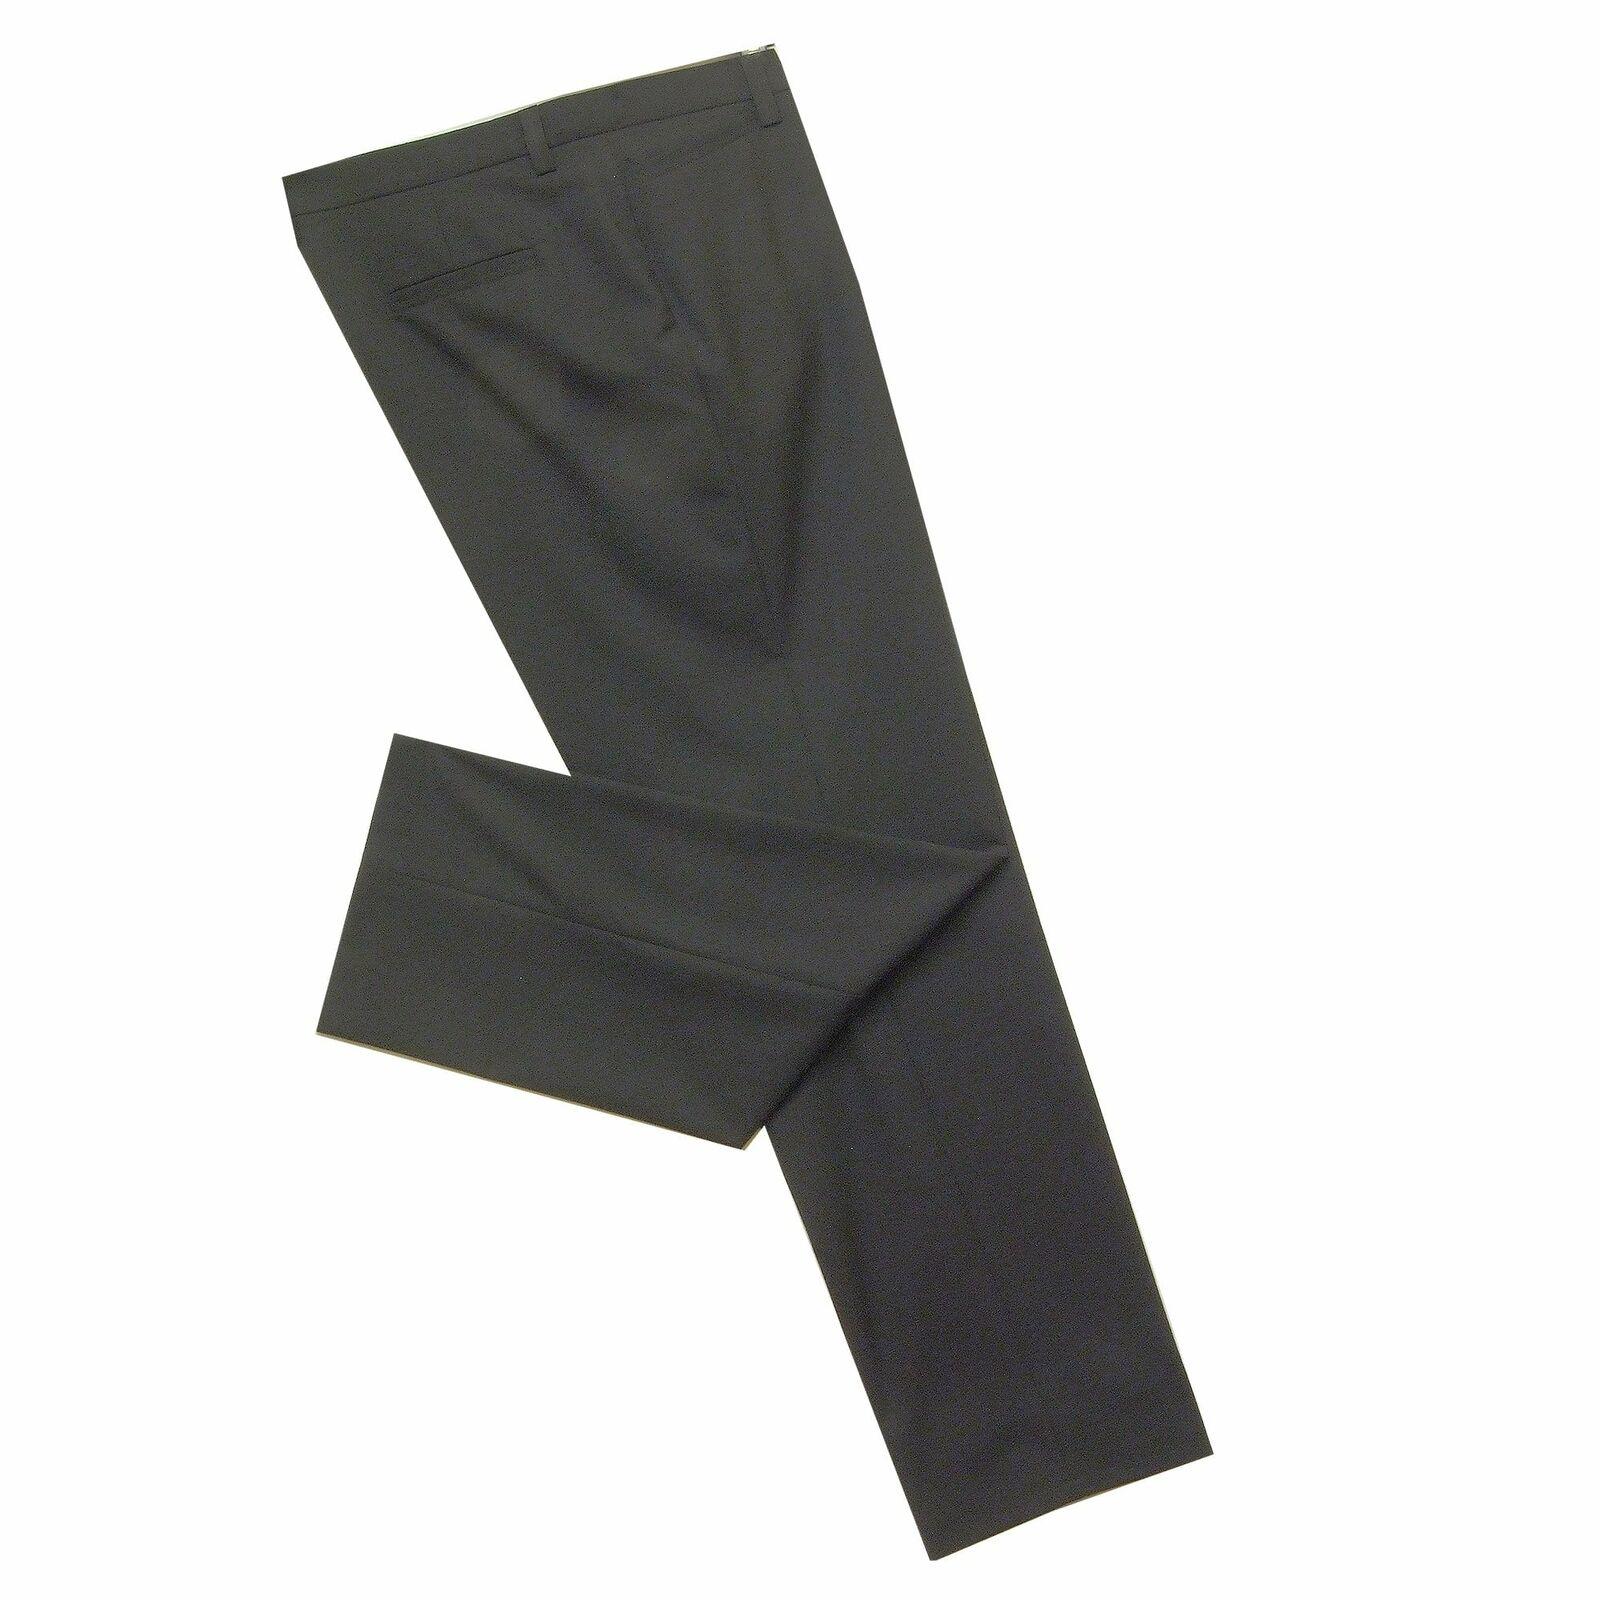 Gardeur Pantaloni Kayla 5 5 5 68460 Nero 9aad50